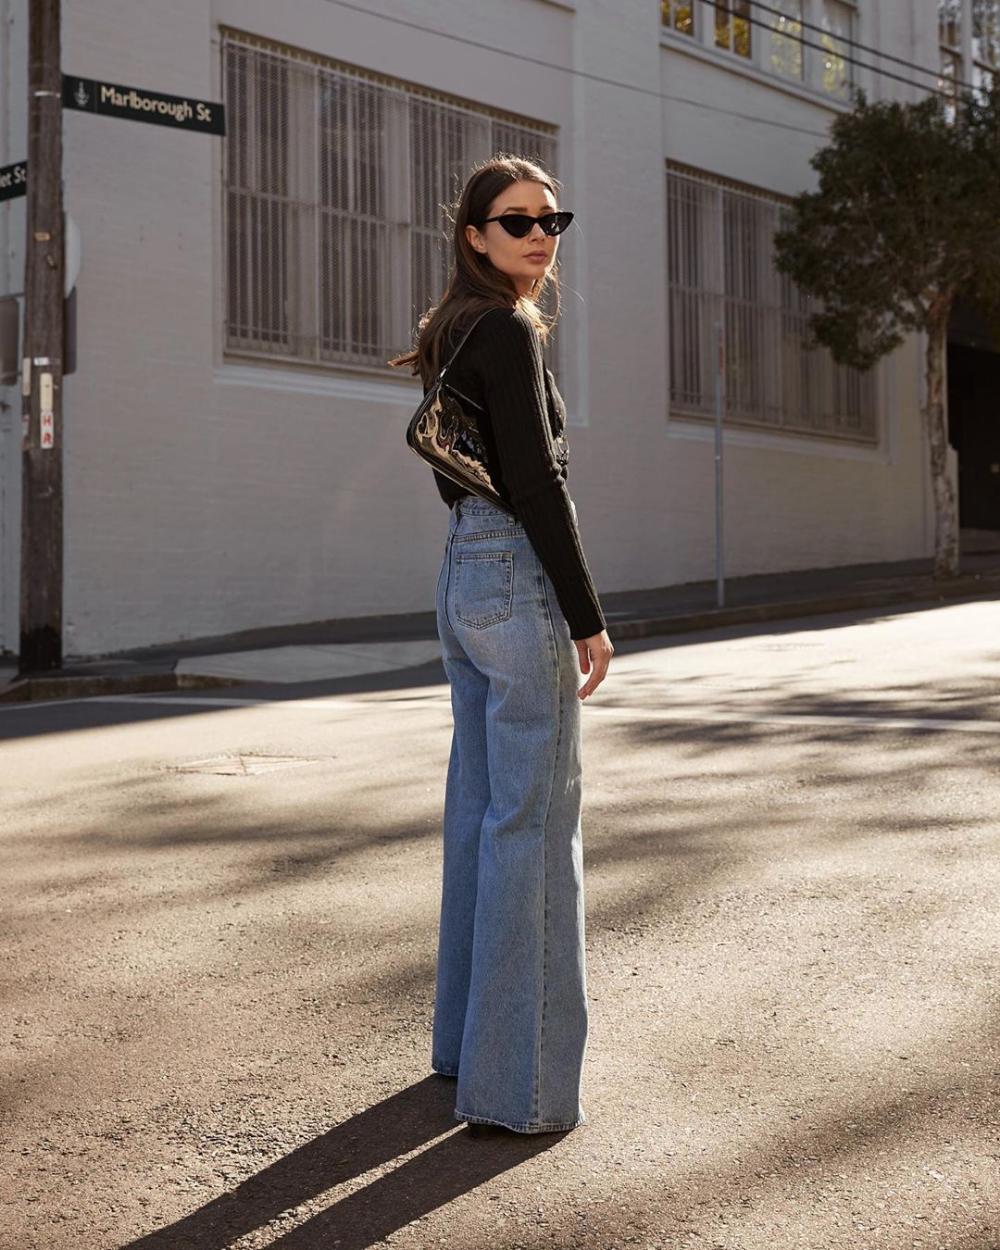 Sara Crampton Of Harper Harley Instagram Outfit Idea For Spring Black Cat Eye Sunglasses Black Top 90s Womens Black Dress Pants Denim Fashion Fashion [ 1250 x 1000 Pixel ]